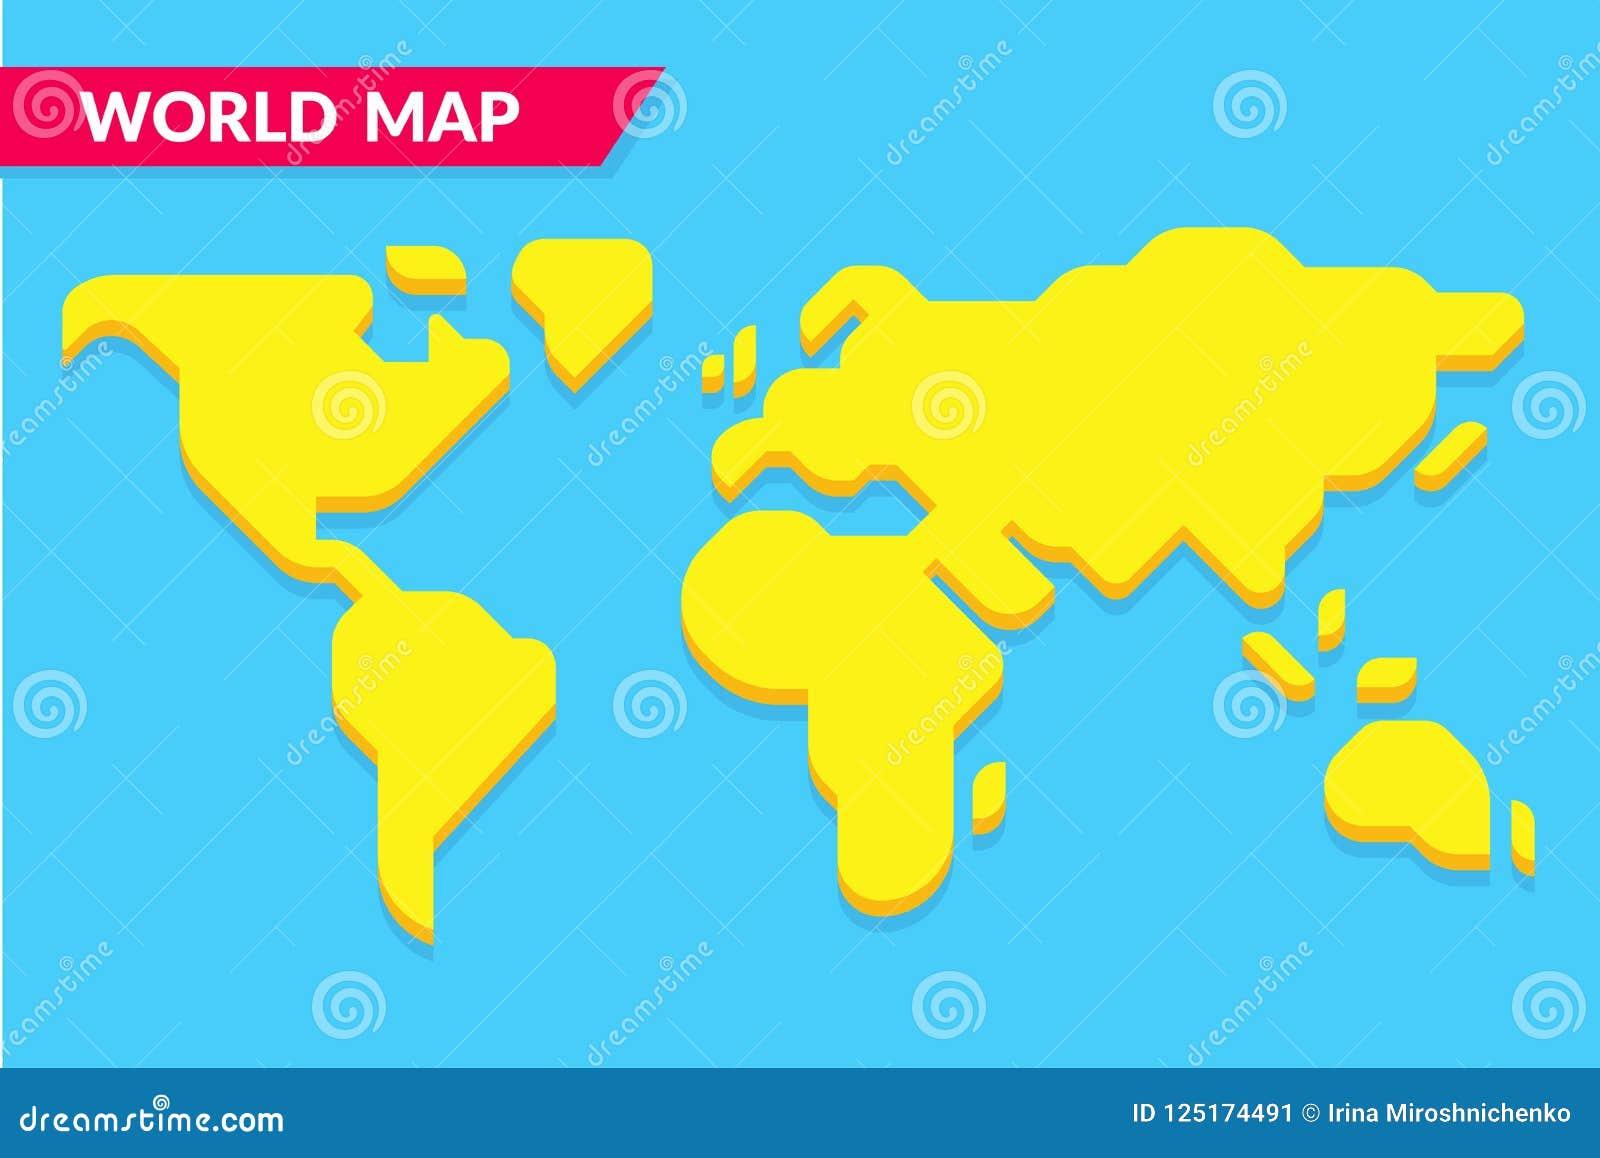 Simple Cartoon Style World Map Stock Vector Illustration Of Flat